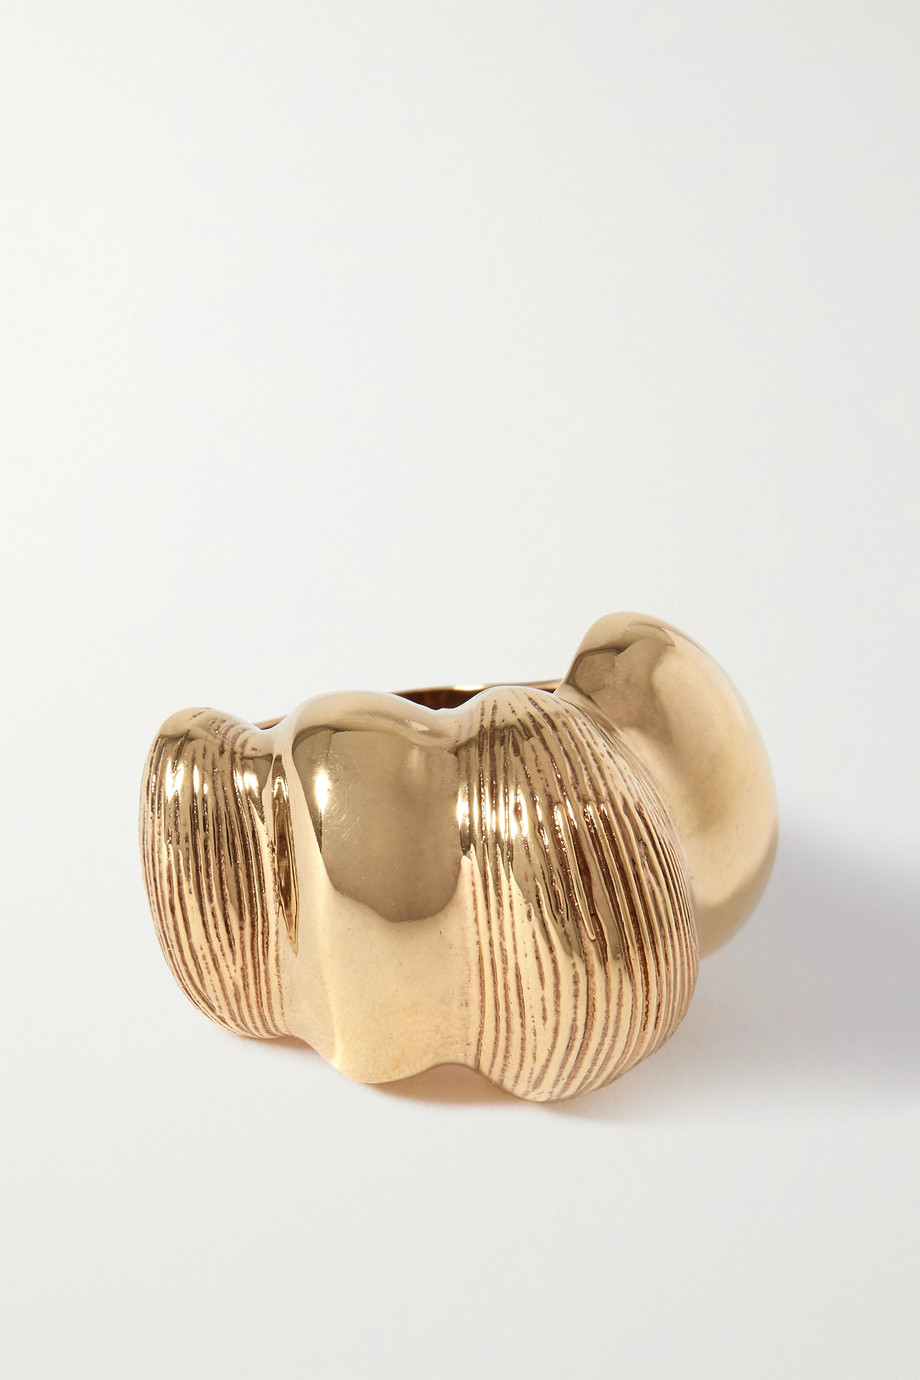 Chloé Feminities gold-tone ring